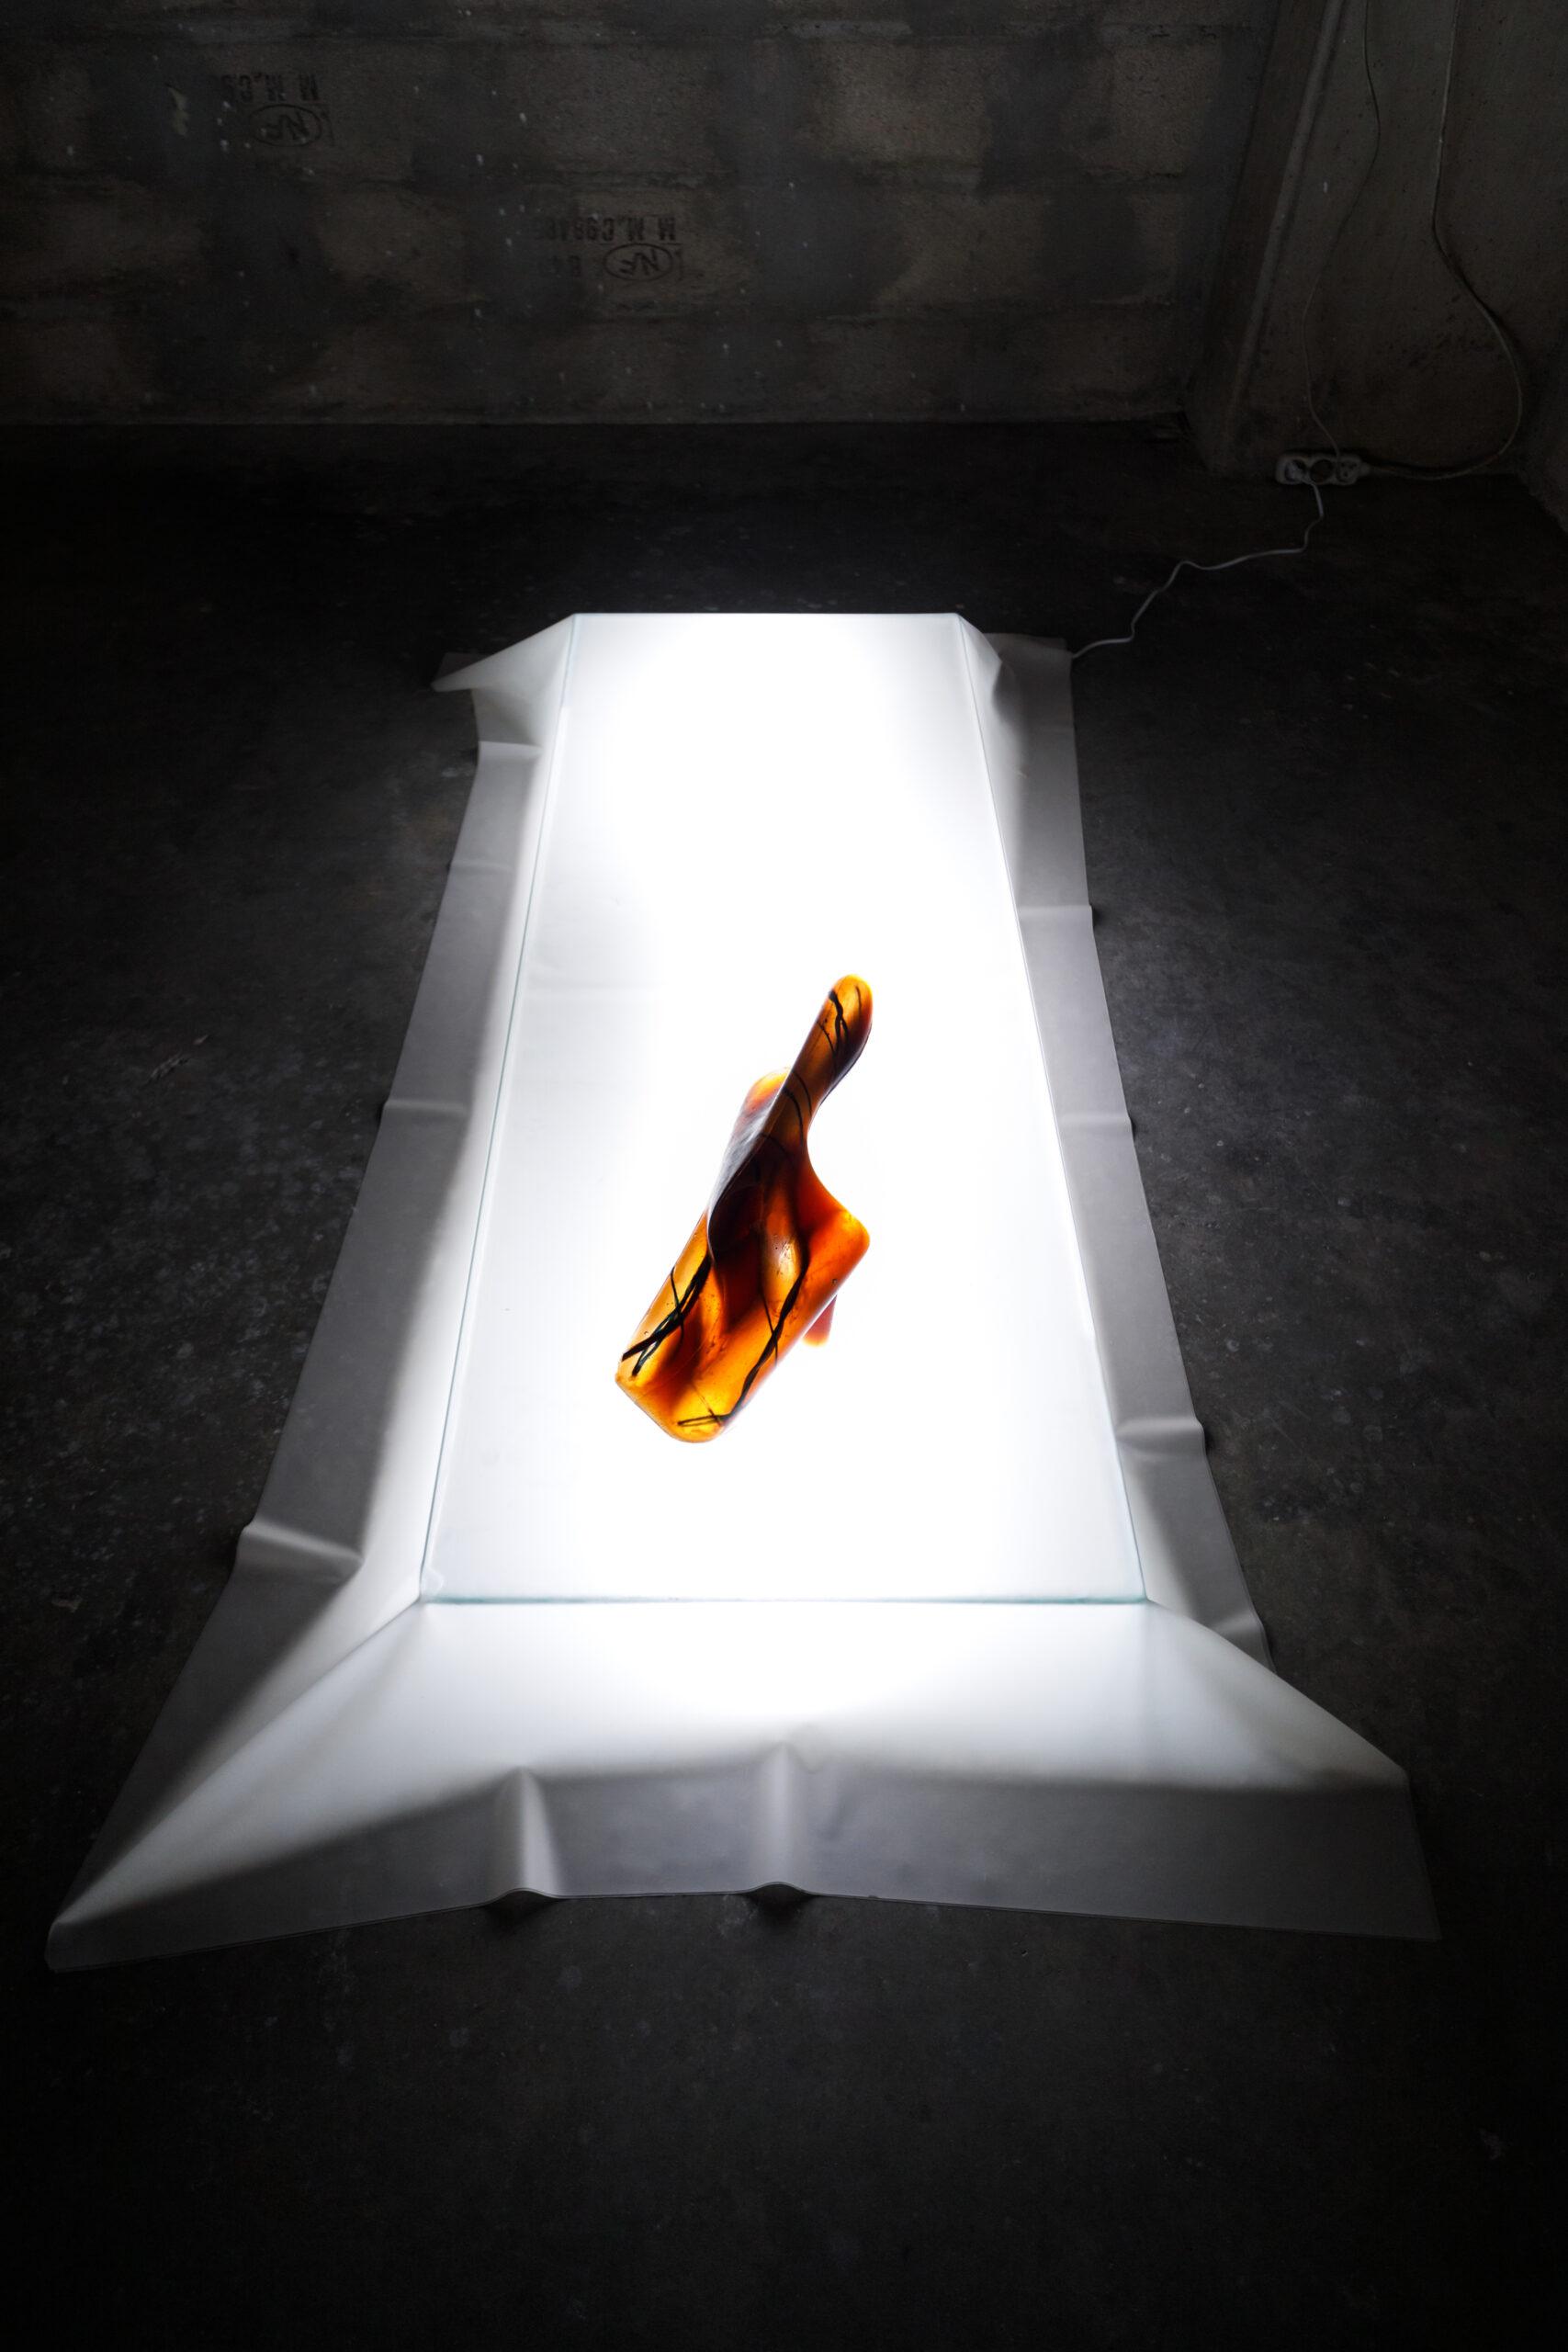 Roy Köhnke, At heart, (série), 2021, elastomère, ficelle agricole, tube latex, dimensions variables. Vues d'exposition, ANTE:IRL, Wonder/Fortin, Clichy, 2021, Crédit photo : Salim Santa Lucia